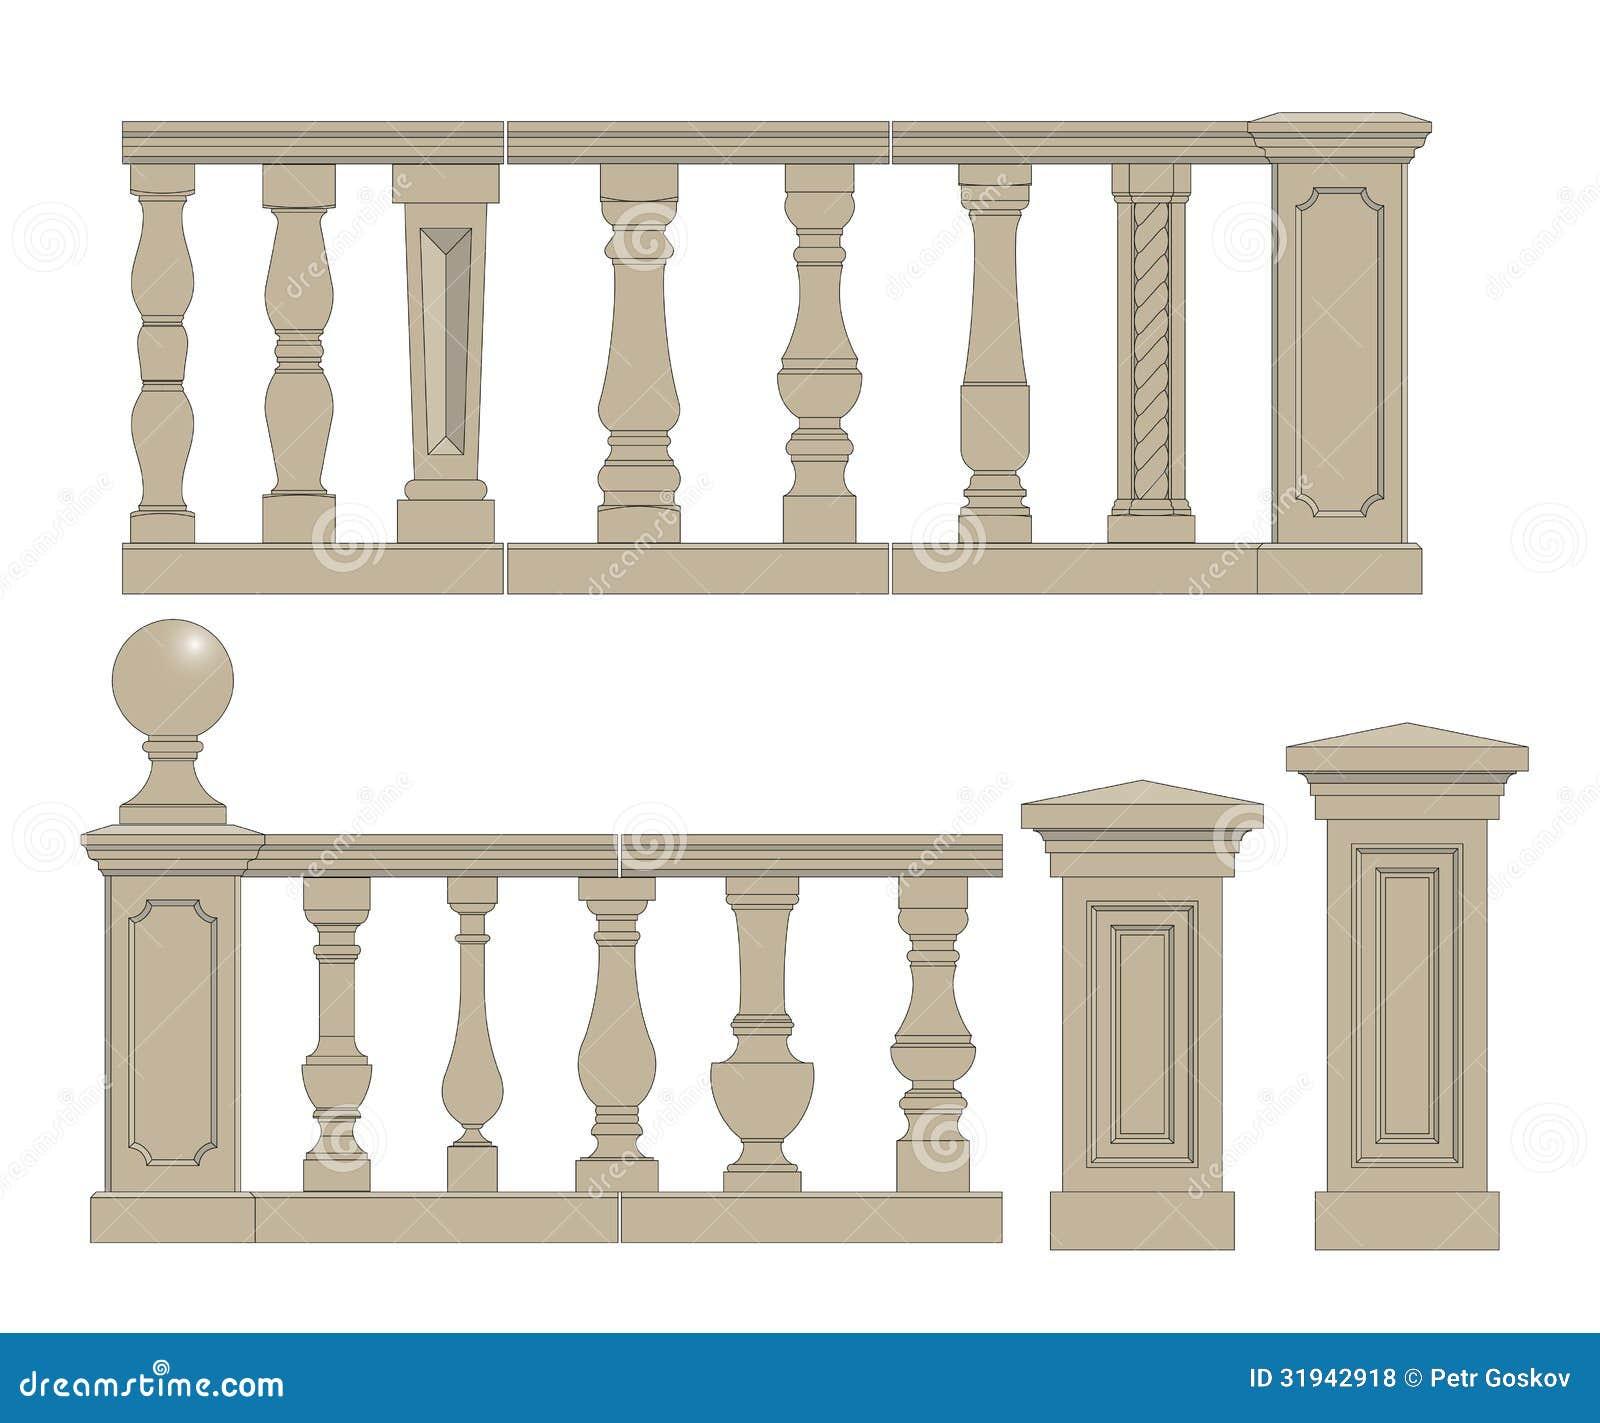 flat balusters set royalty free stock photos image 31942918. Black Bedroom Furniture Sets. Home Design Ideas